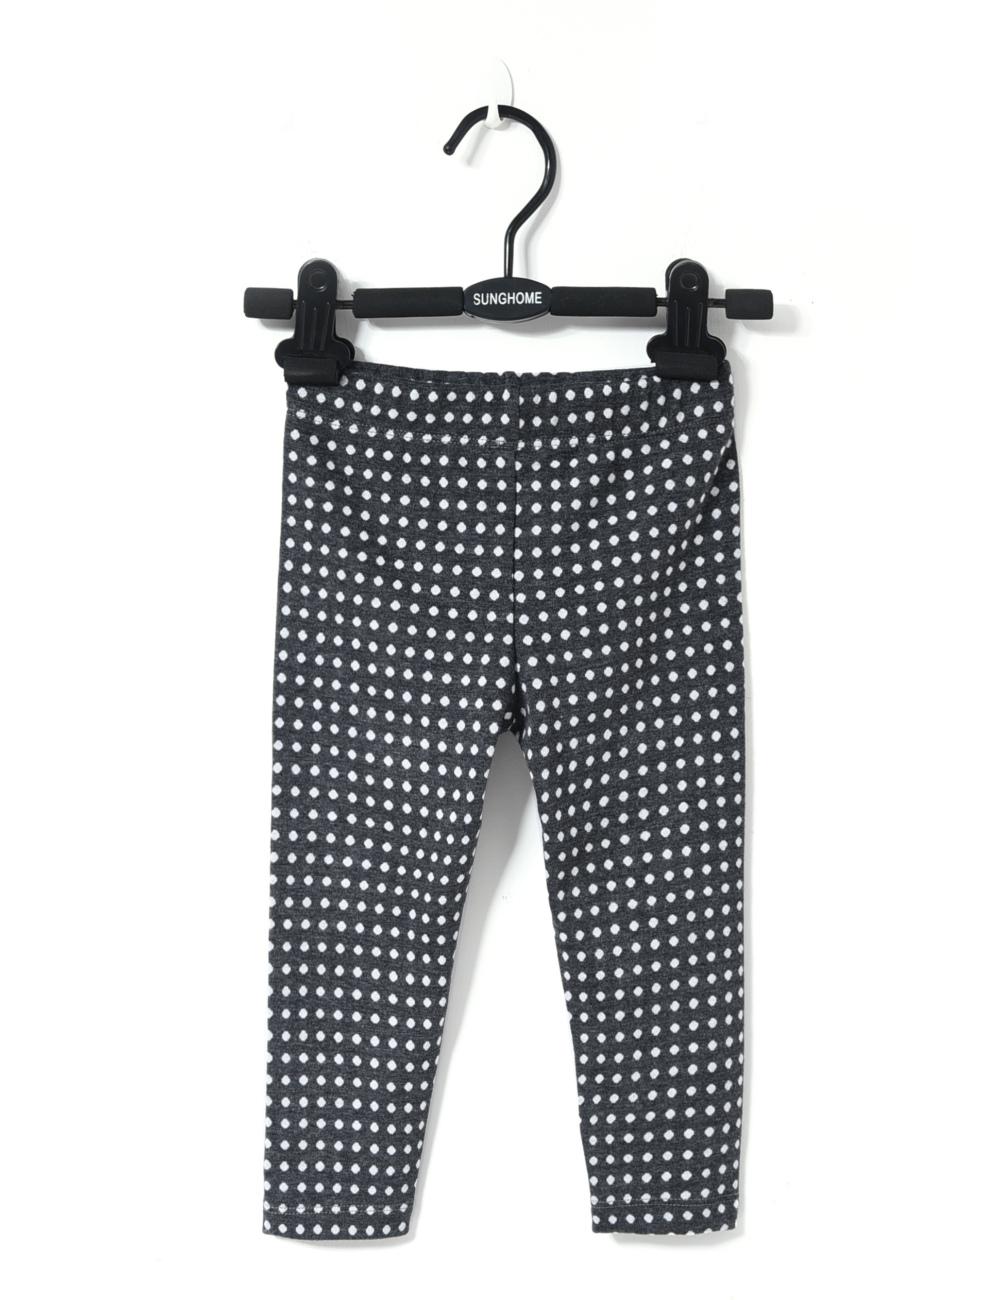 2016 spring autumn newborn baby girl leggings infant girl long pants children dots capri kids warm knitted pants cotton trousers(China (Mainland))